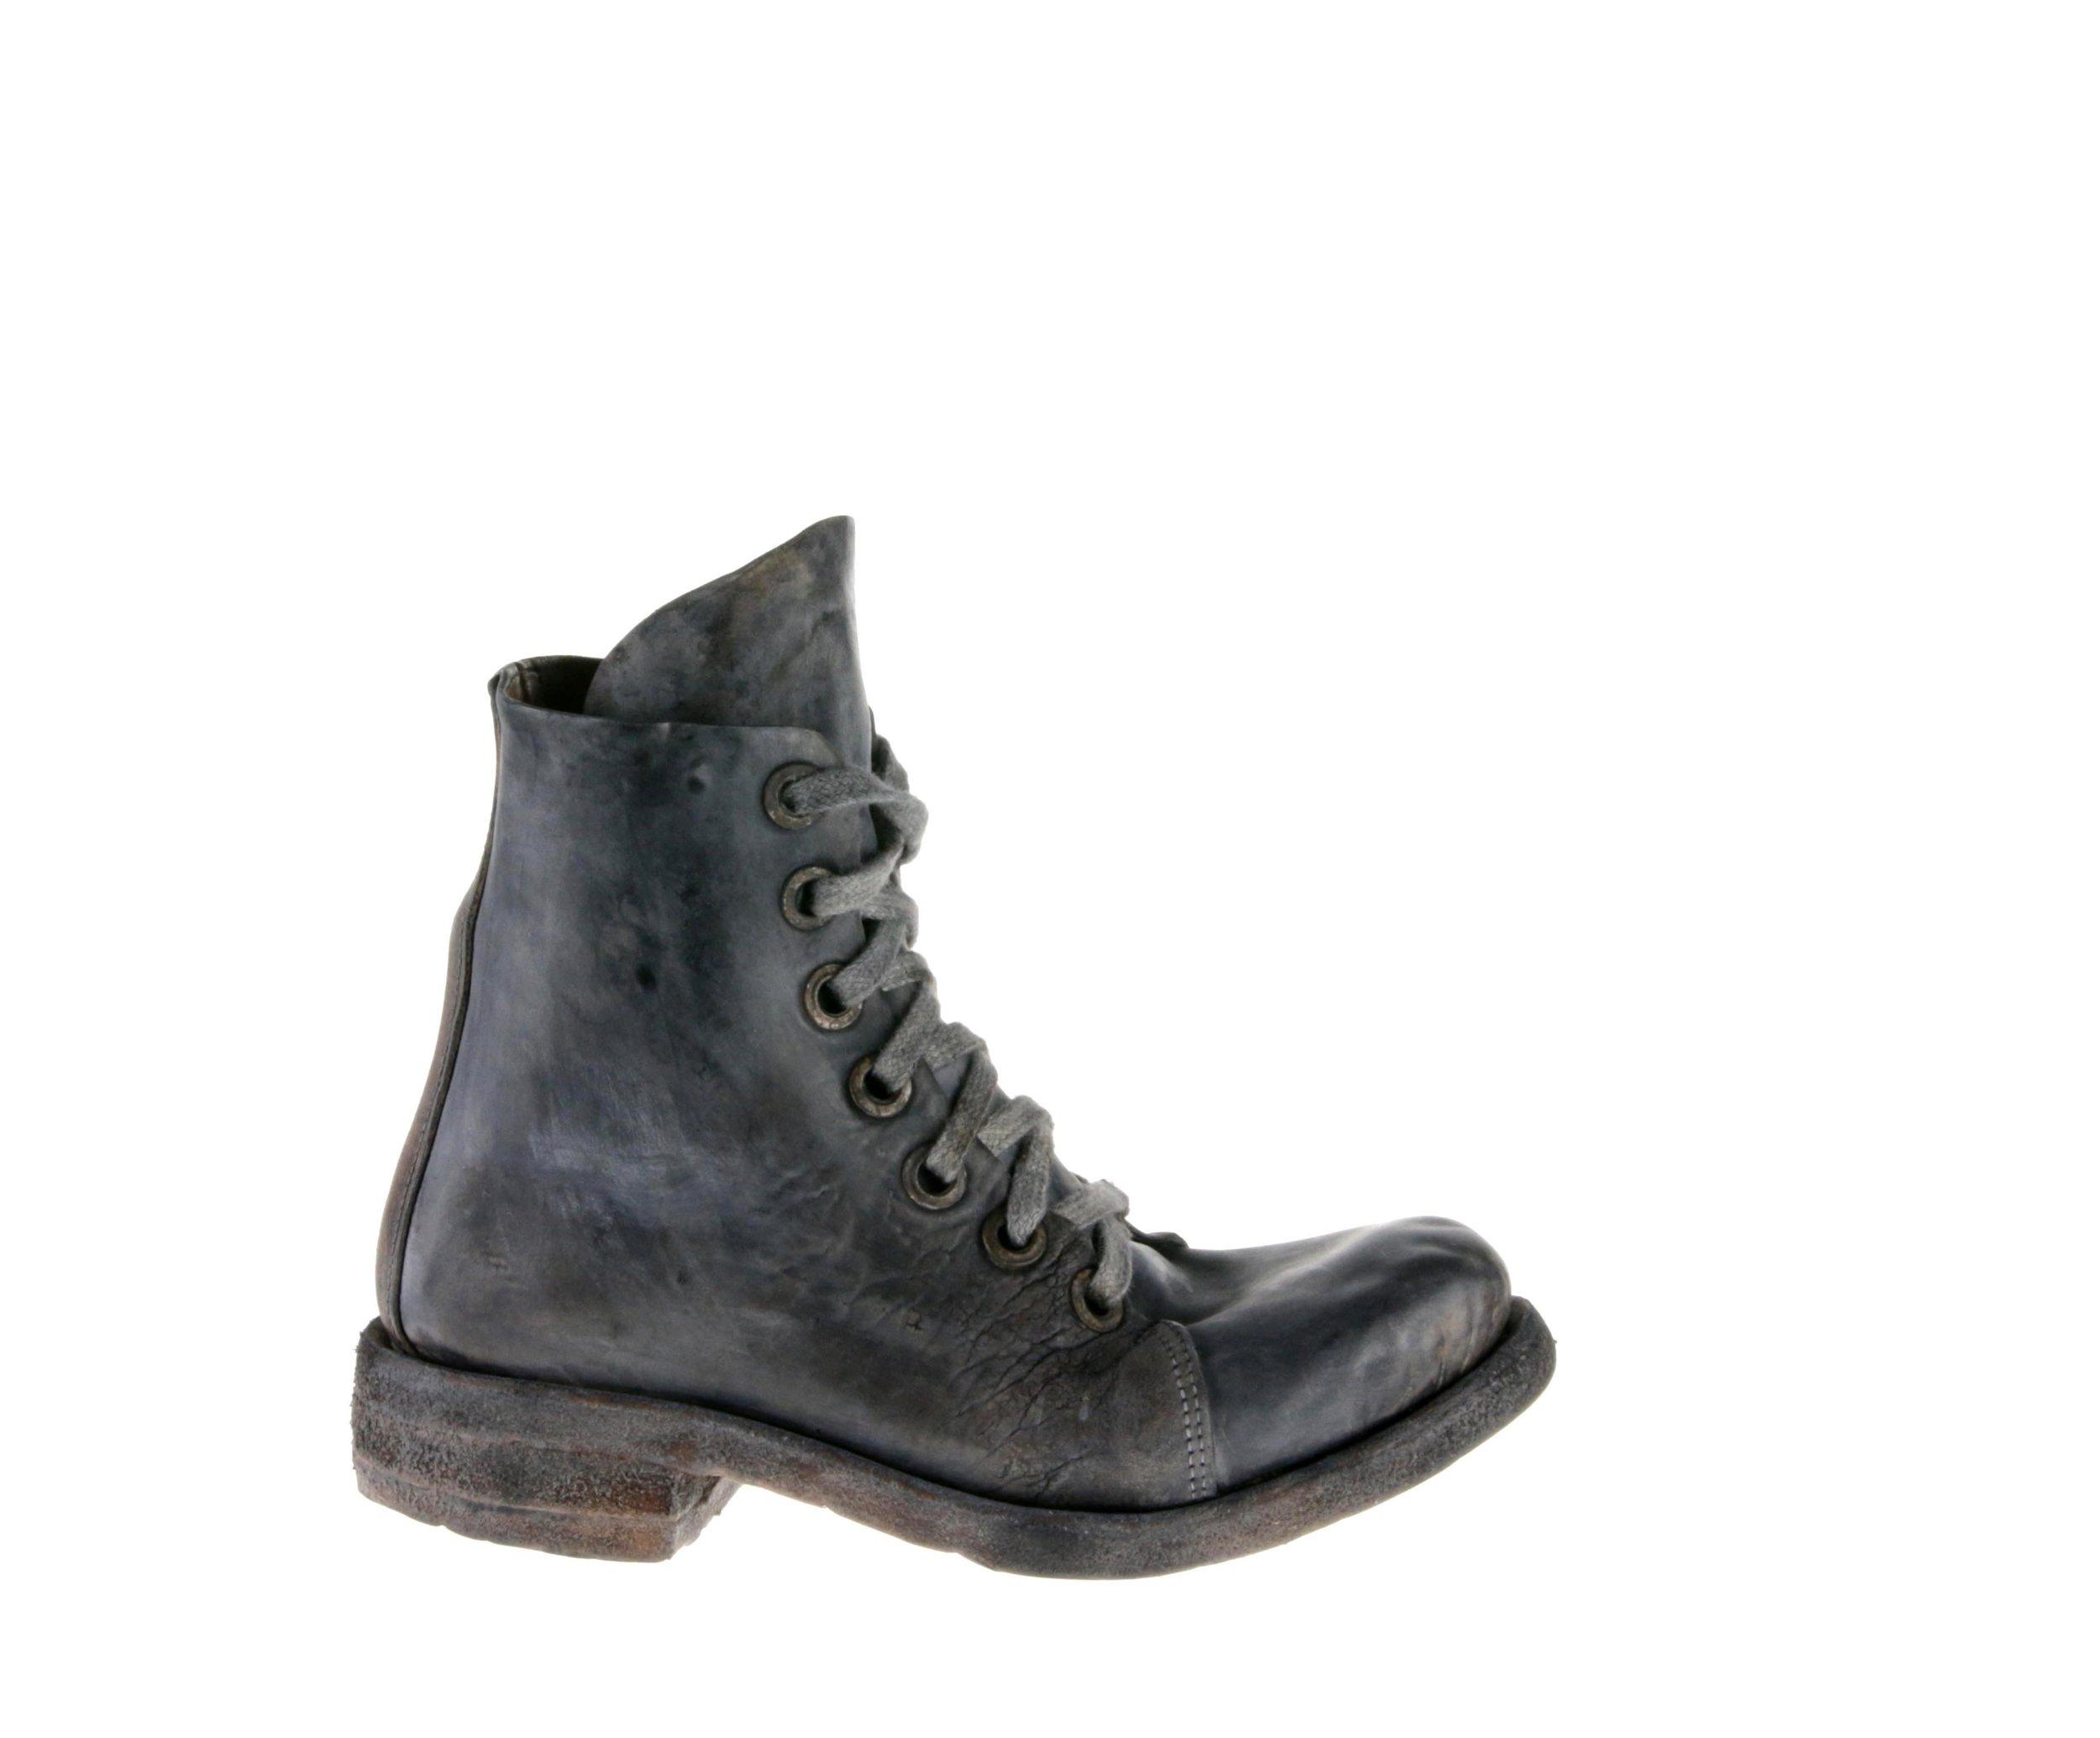 7Hole Boot Light Grey Cordovan Outside.jpg